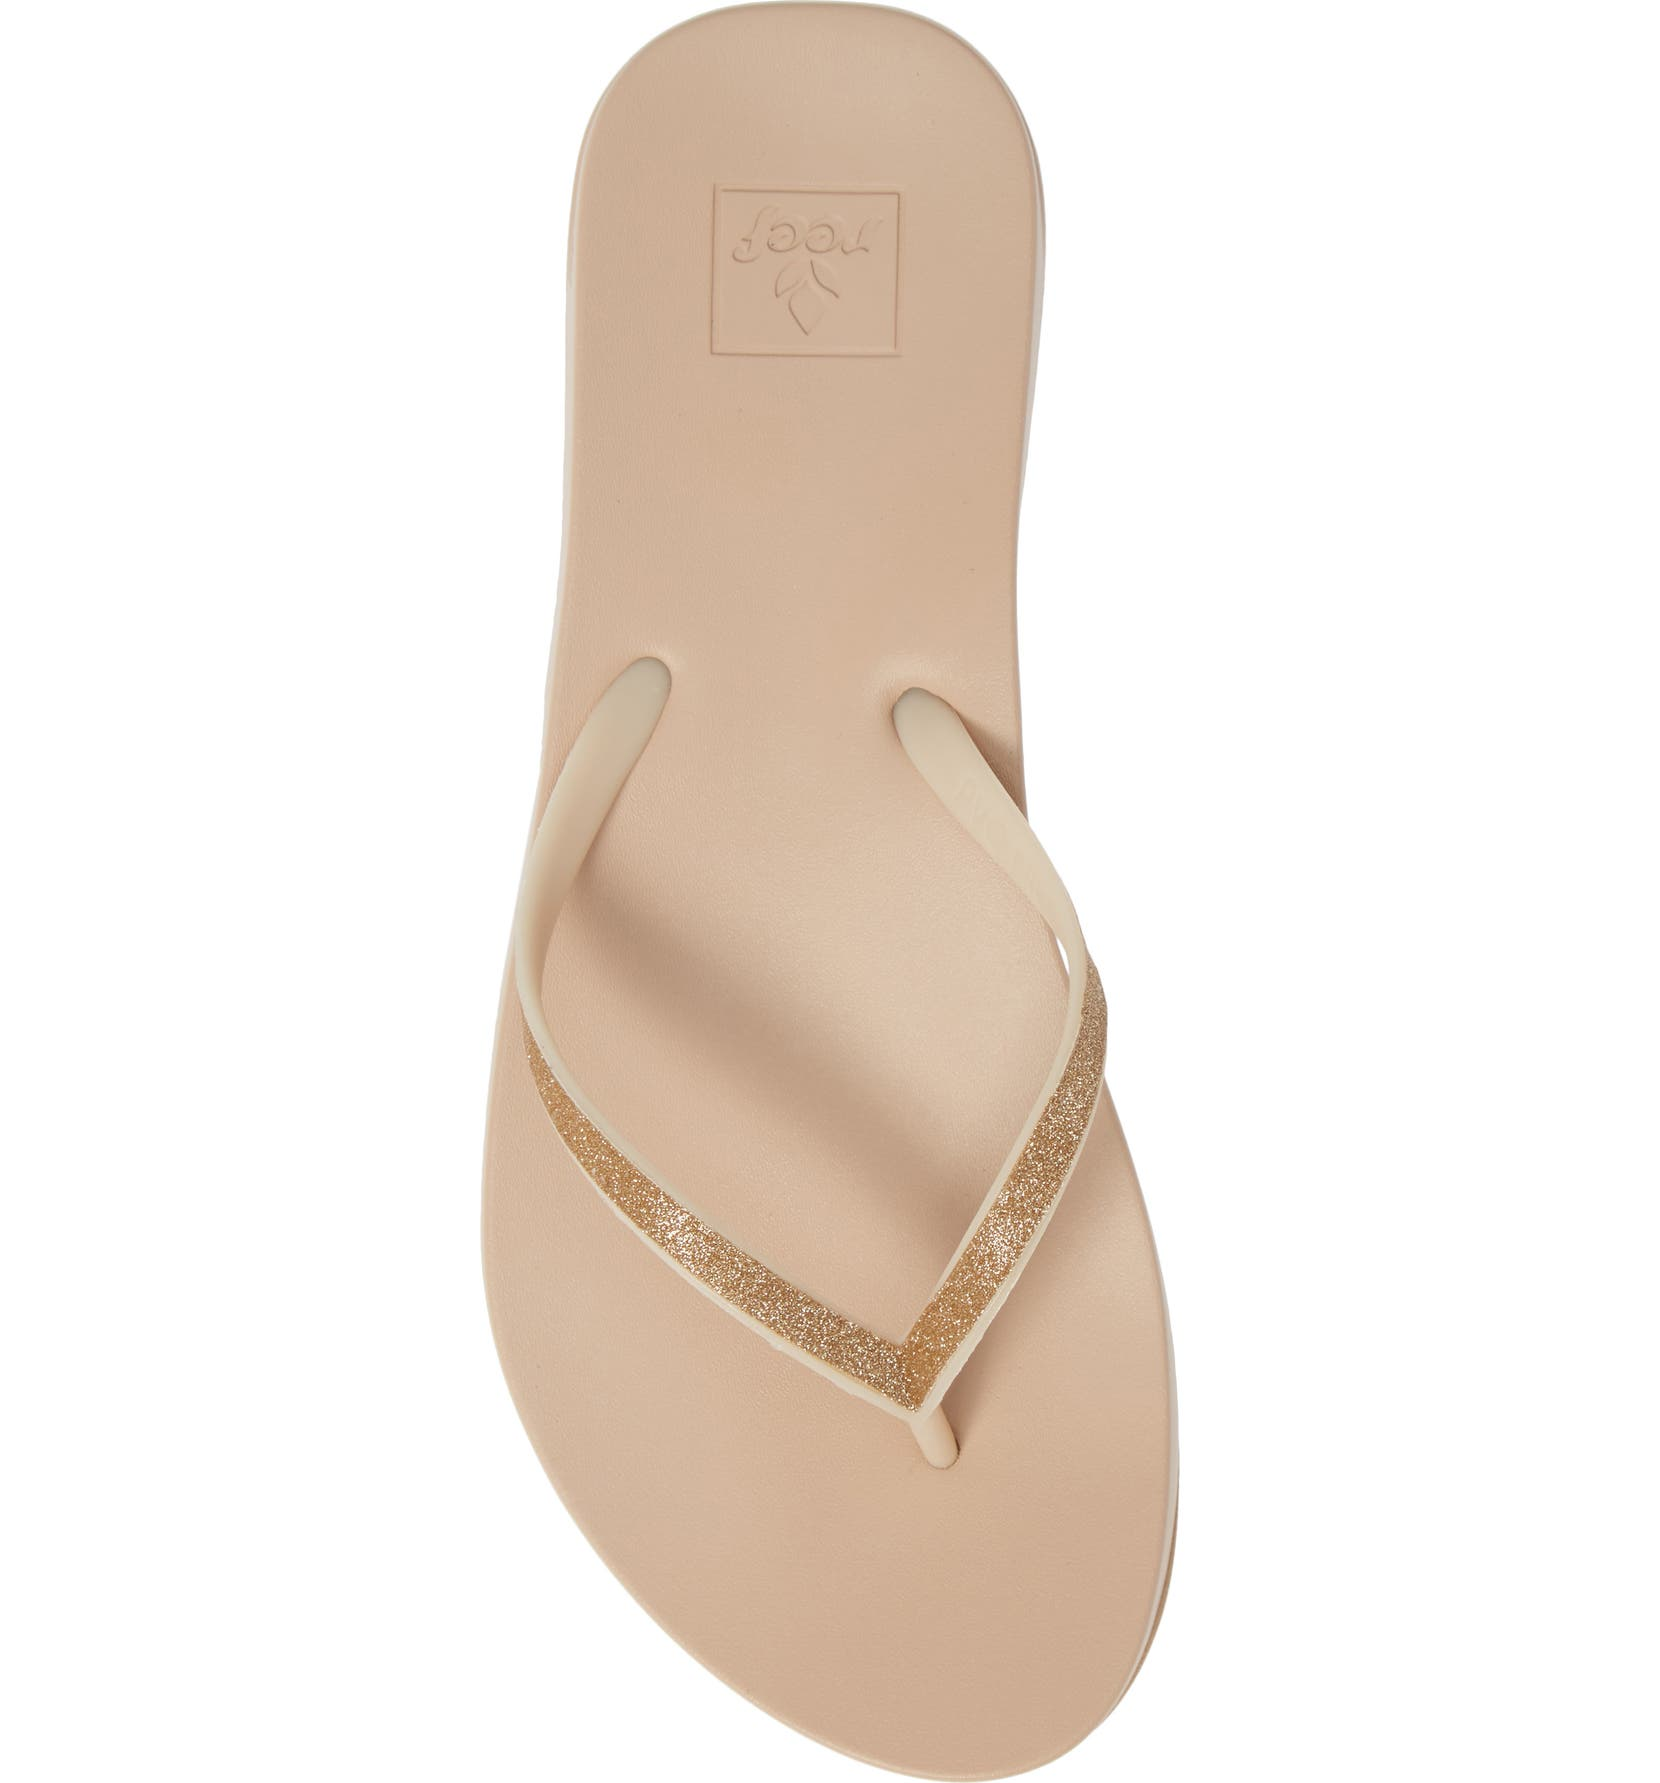 74a1202ab730 Reef Cushion Bounce Stargazer Flip Flop (Women)